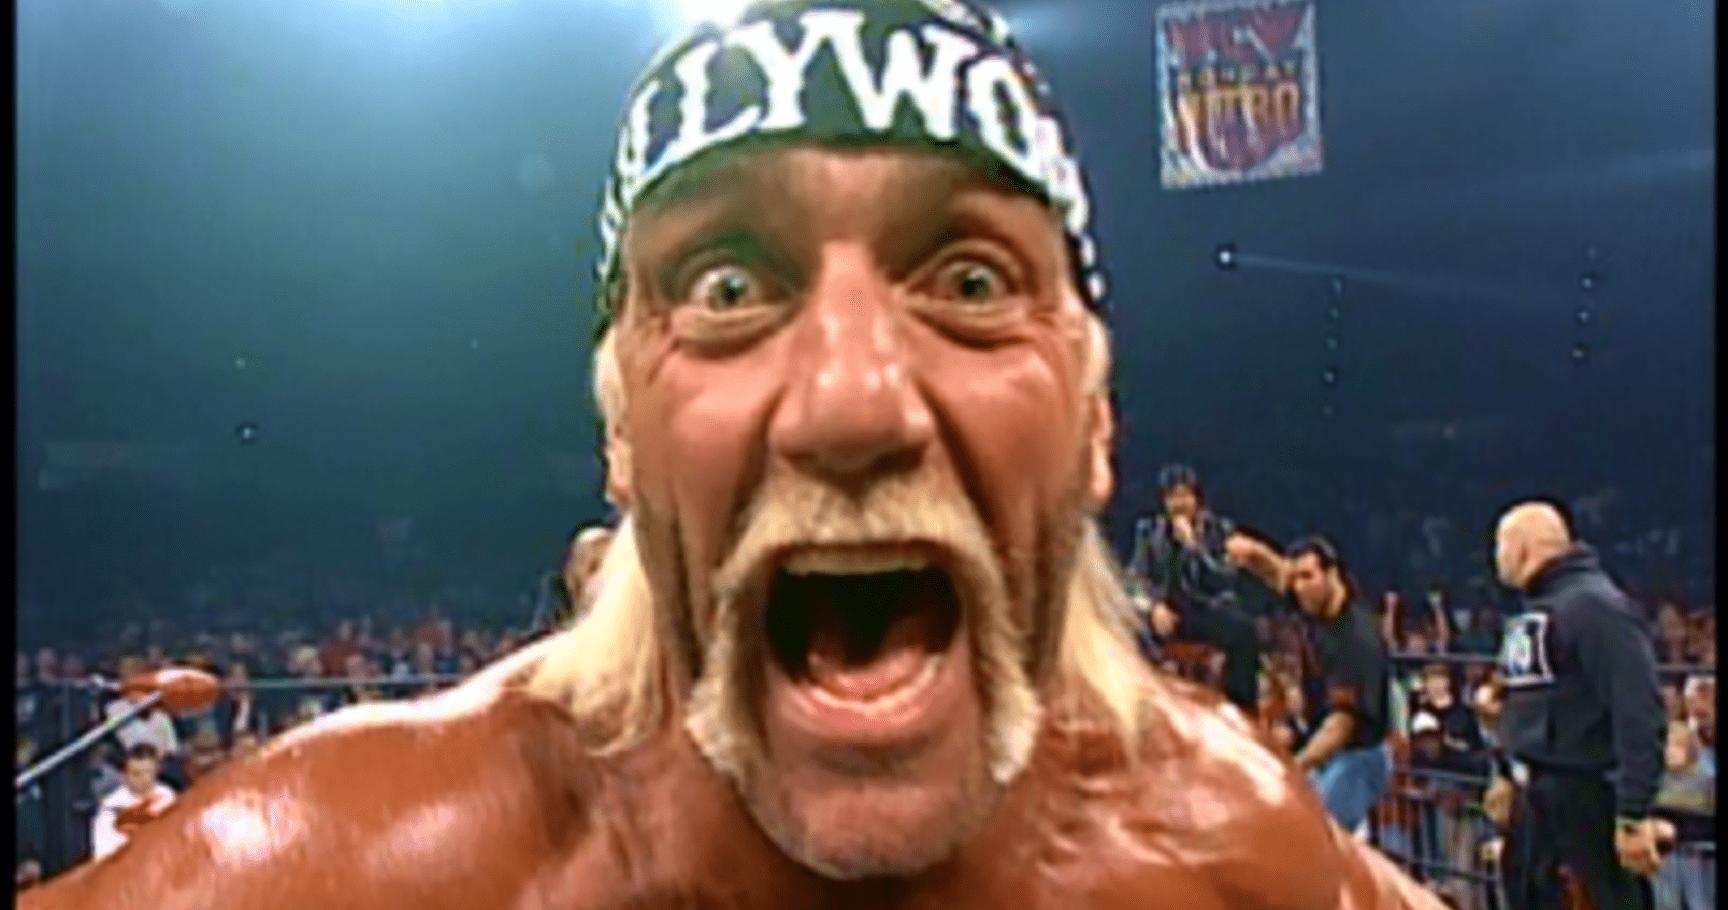 Hulk Hogan mugs for the camera.